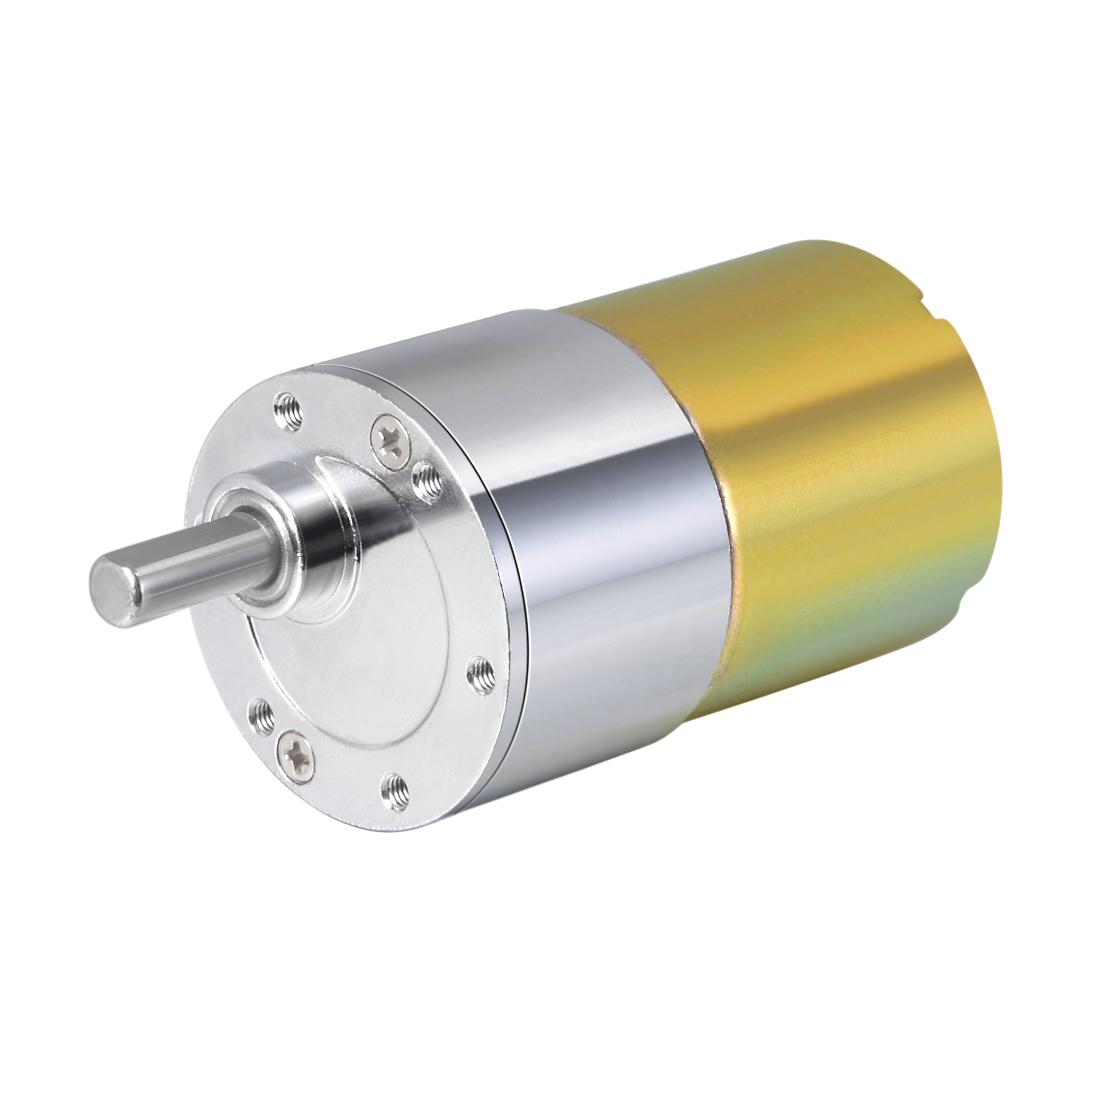 24V DC 600 RPM Gear Motor High Torque Reduction Gearbox Eccentric Output Shaft